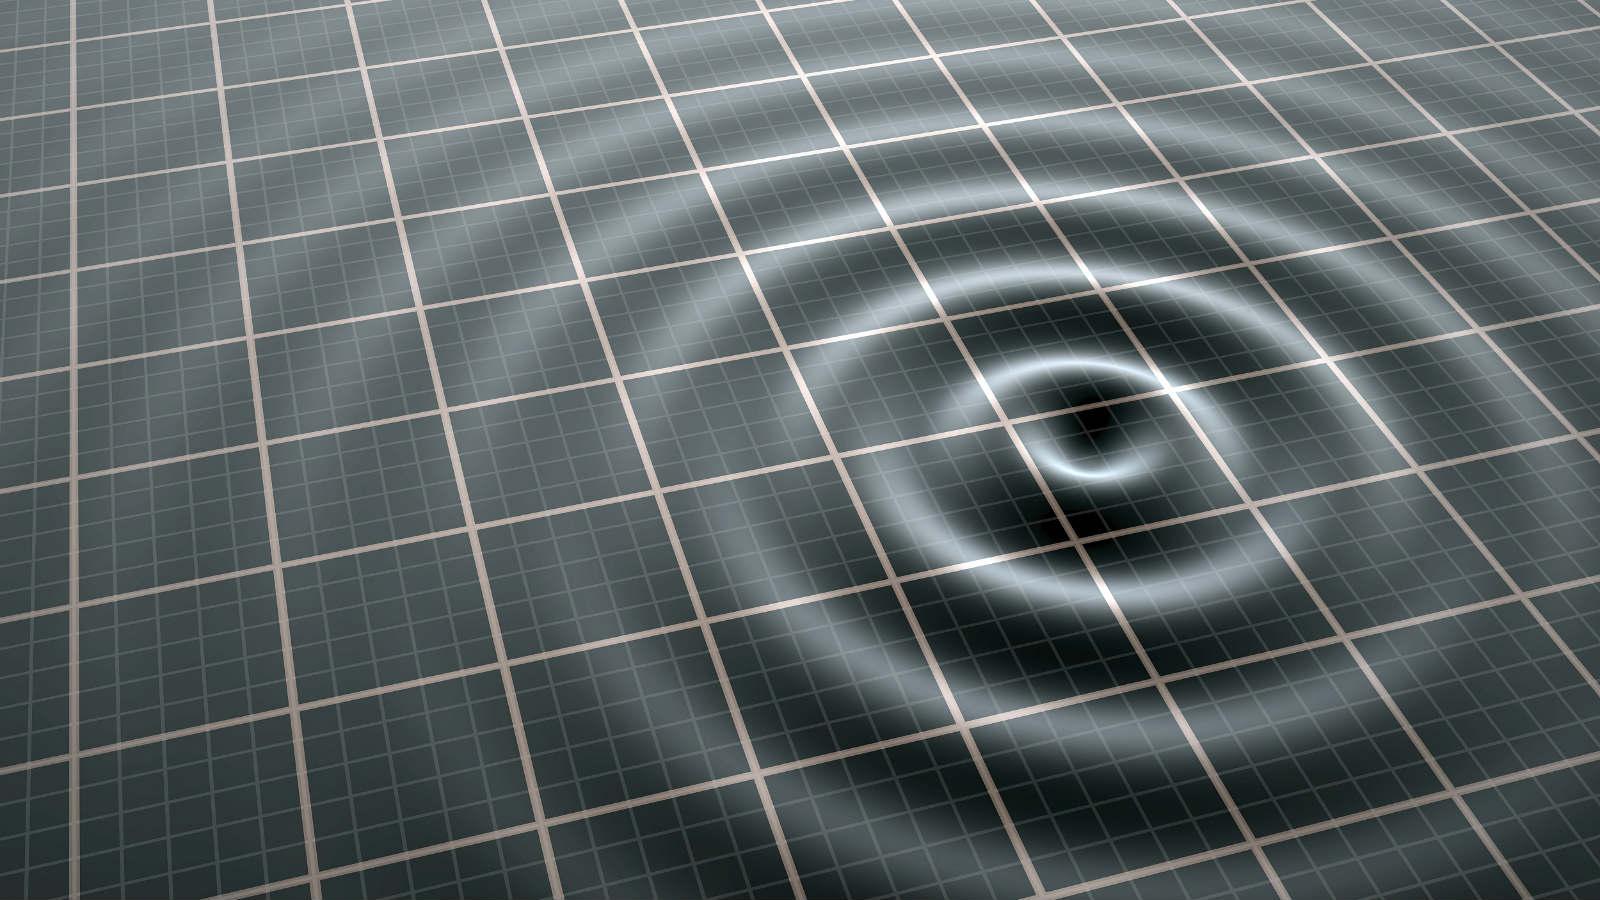 5.1-magnitude quake hits 44 km E of Namie, Japan: USGS